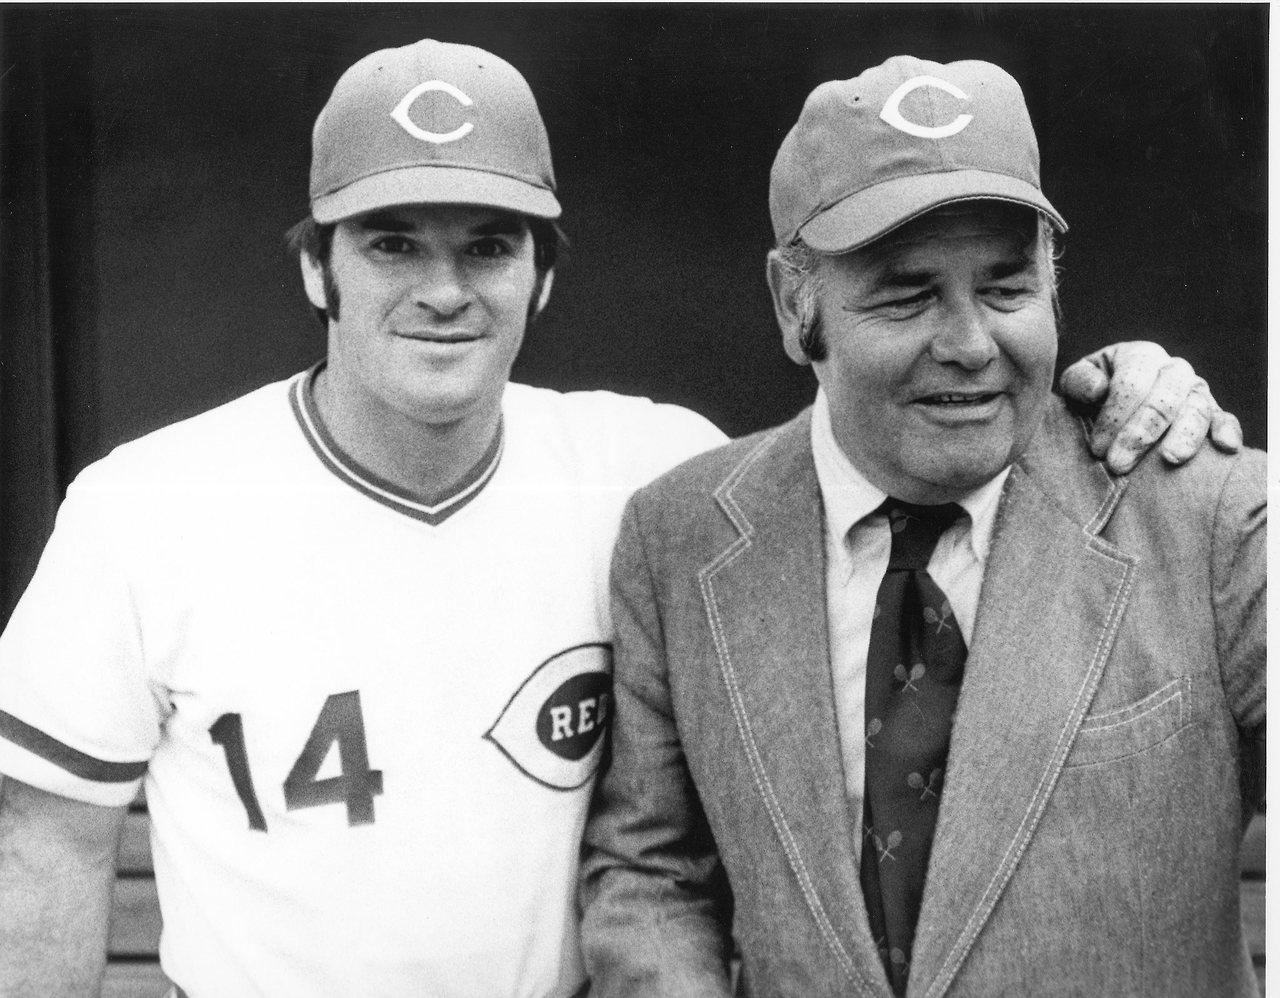 Pete Rose & Jonathan Winters, Baseball & Comedy   Image via   Cincinnati Reds Tumblr